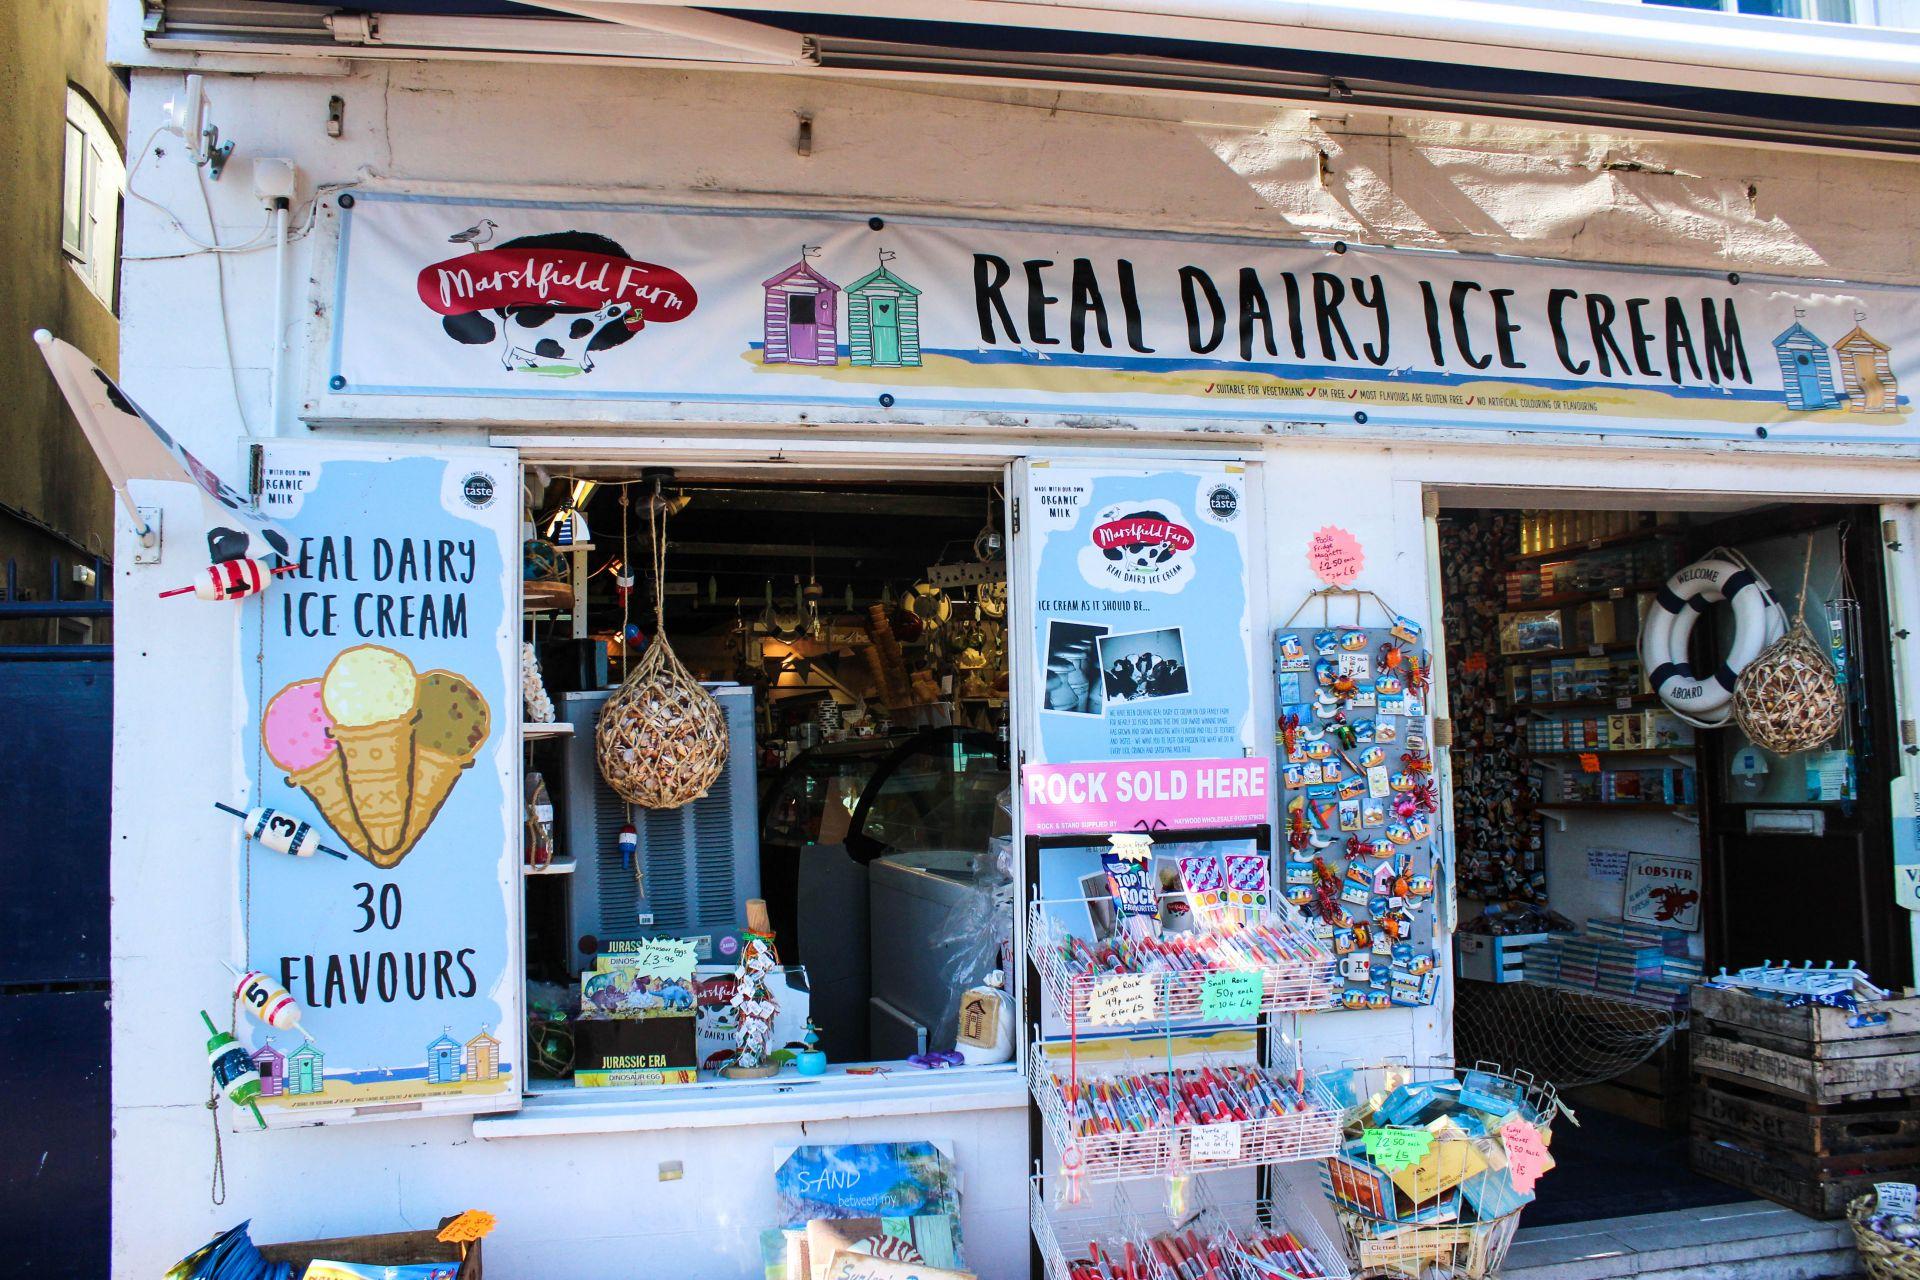 ice cream in poole, real dairy ice cream